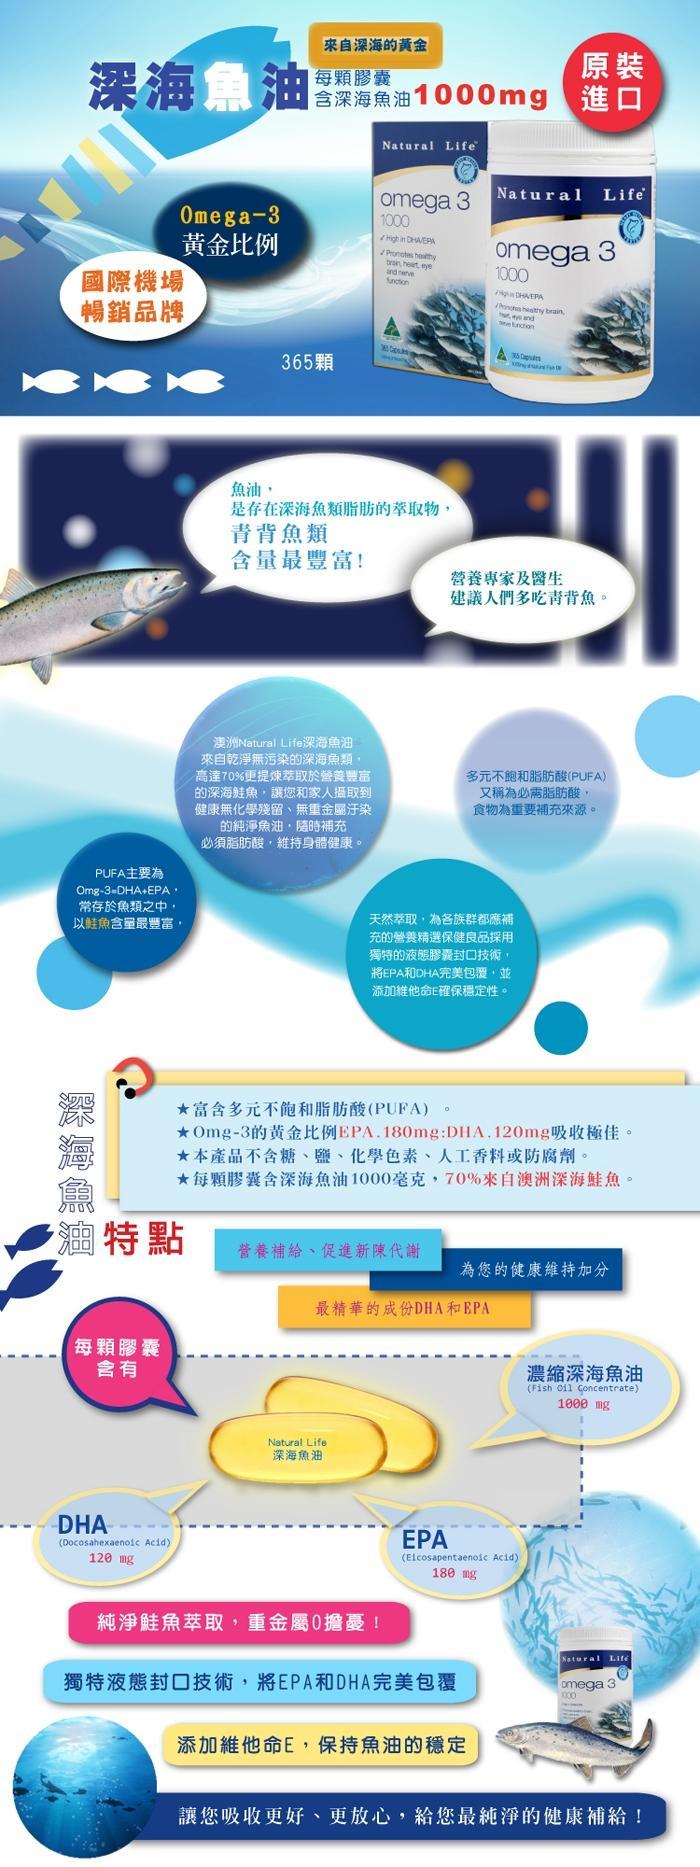 Natural Life-高純度深海魚油1000mg(365粒)產品資訊